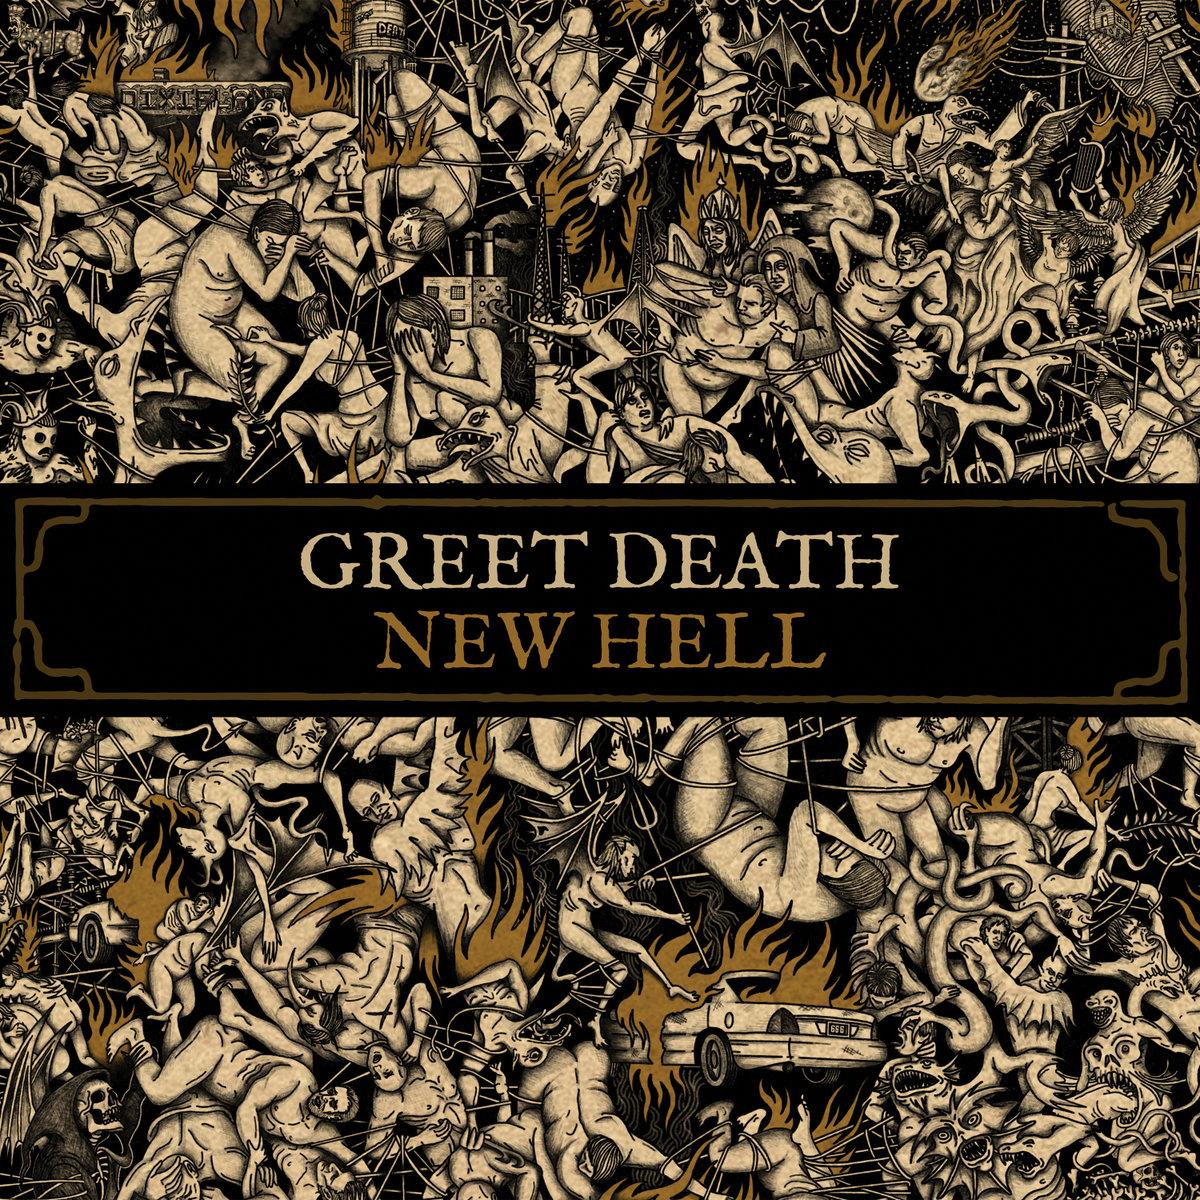 Greet Death - New Hell LP